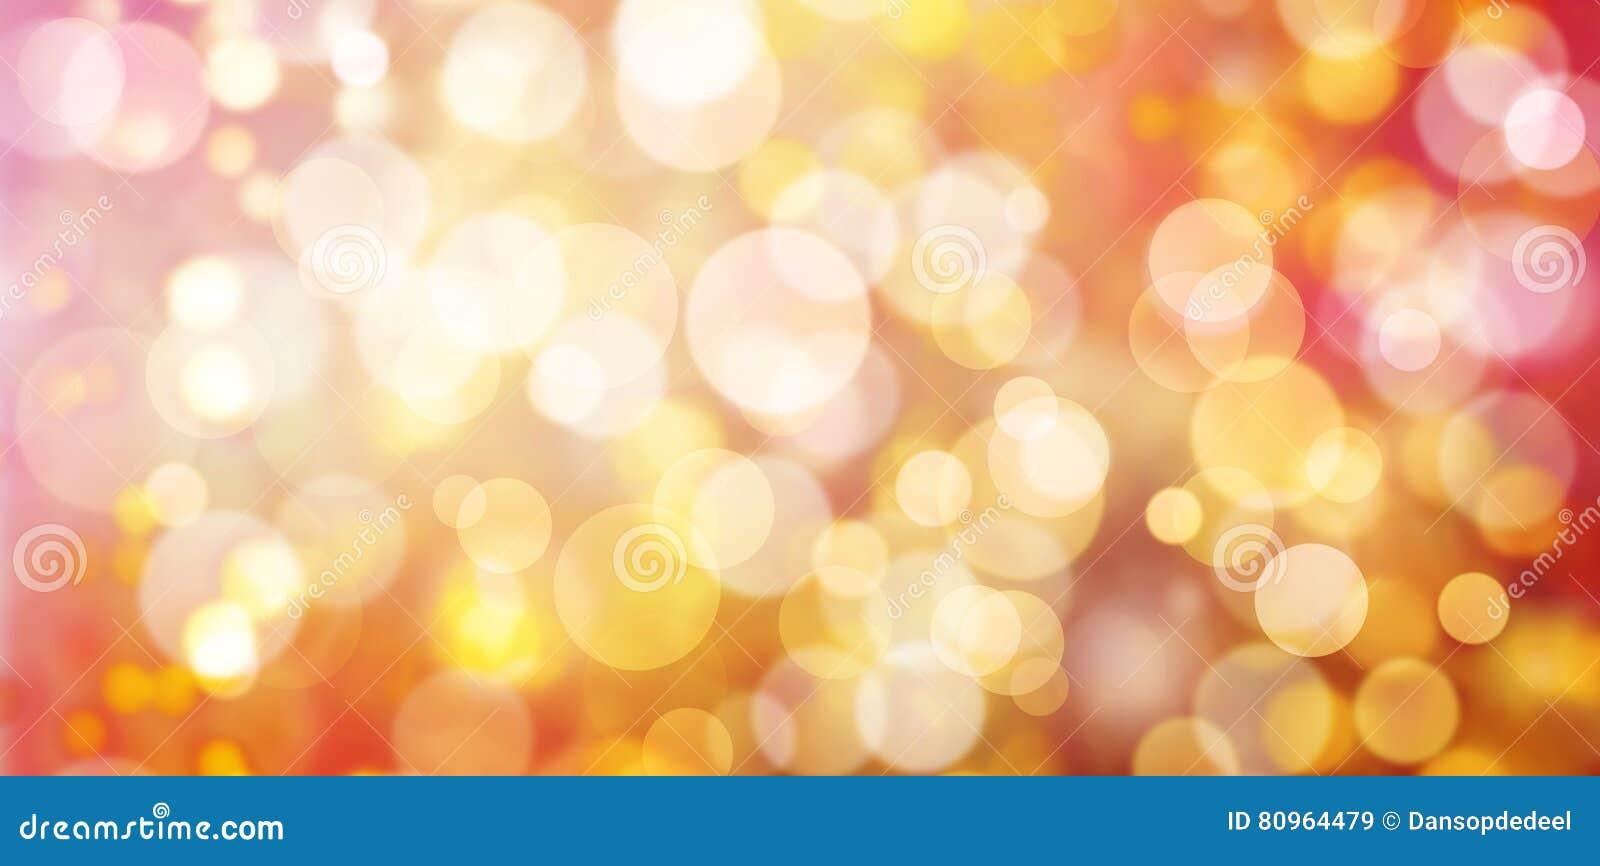 Pastel Bokeh Christmas Lights Stock Illustration - Image: 80964479